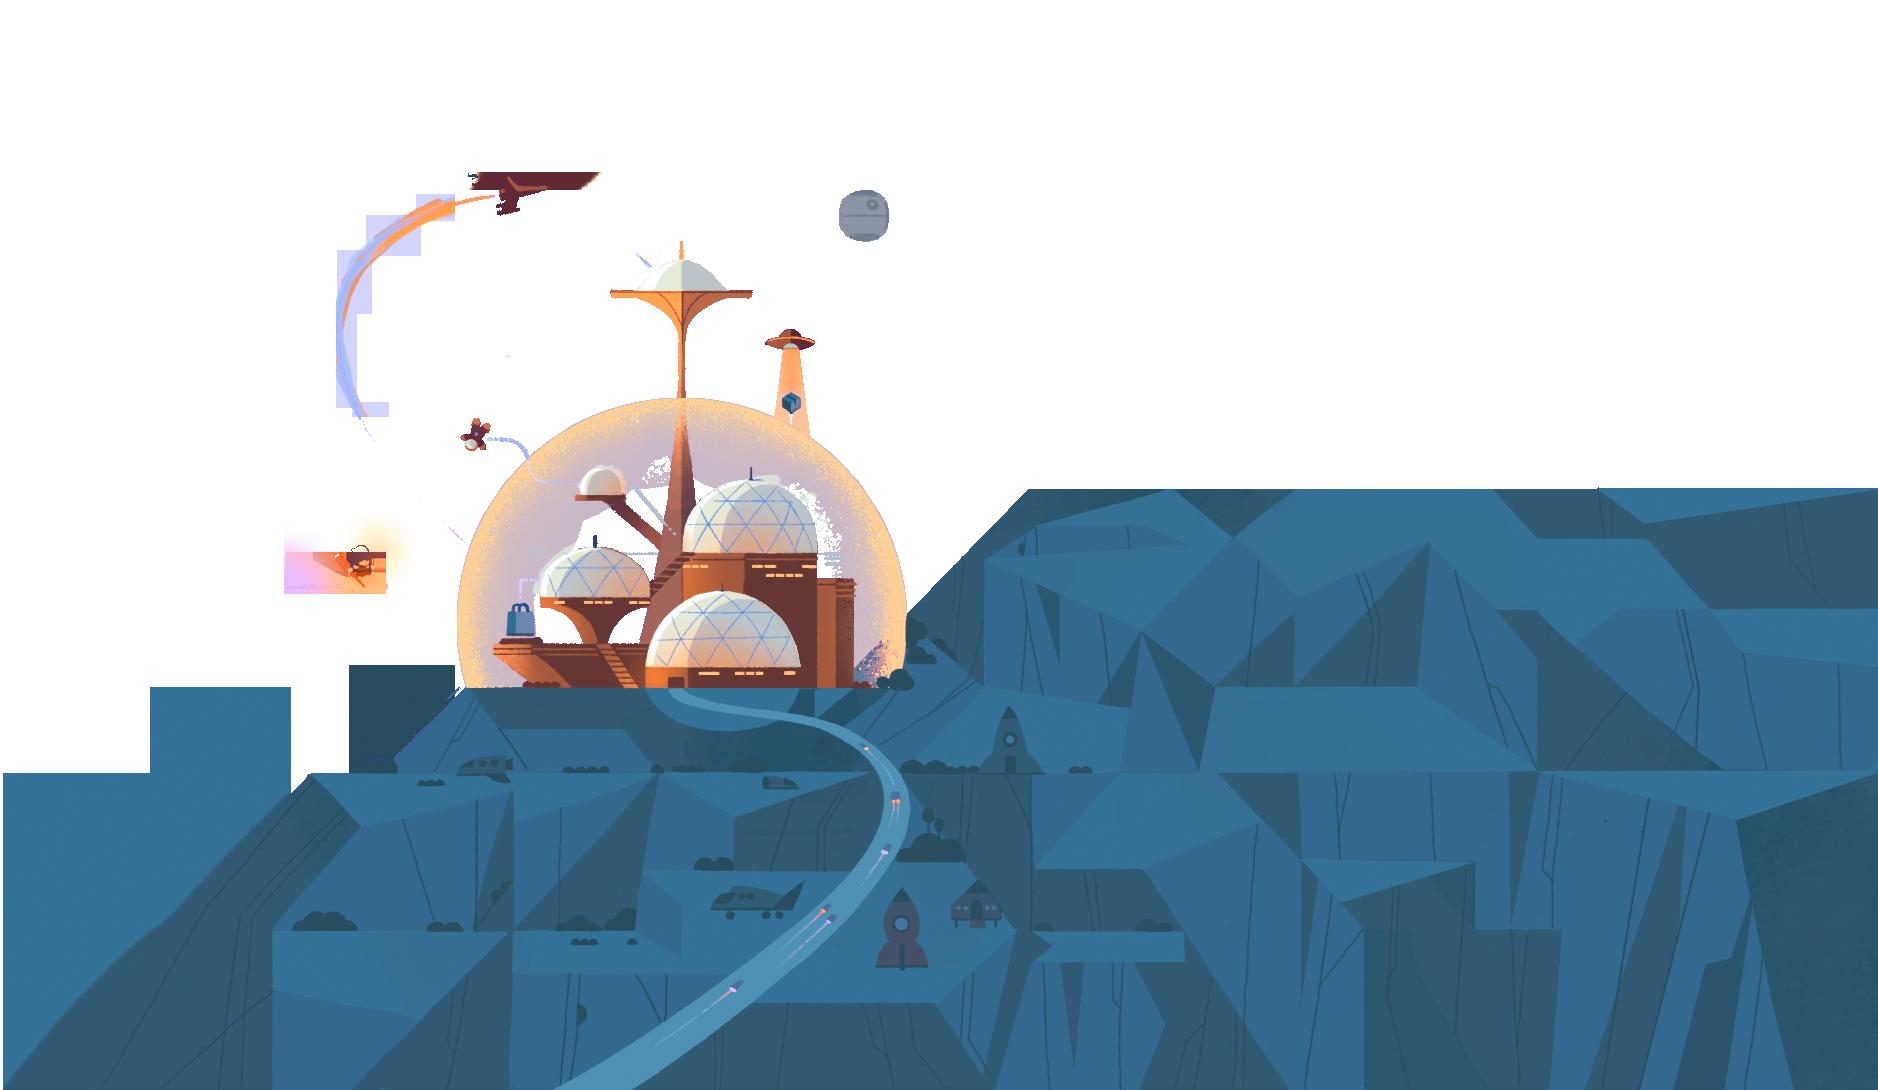 moonshop dome